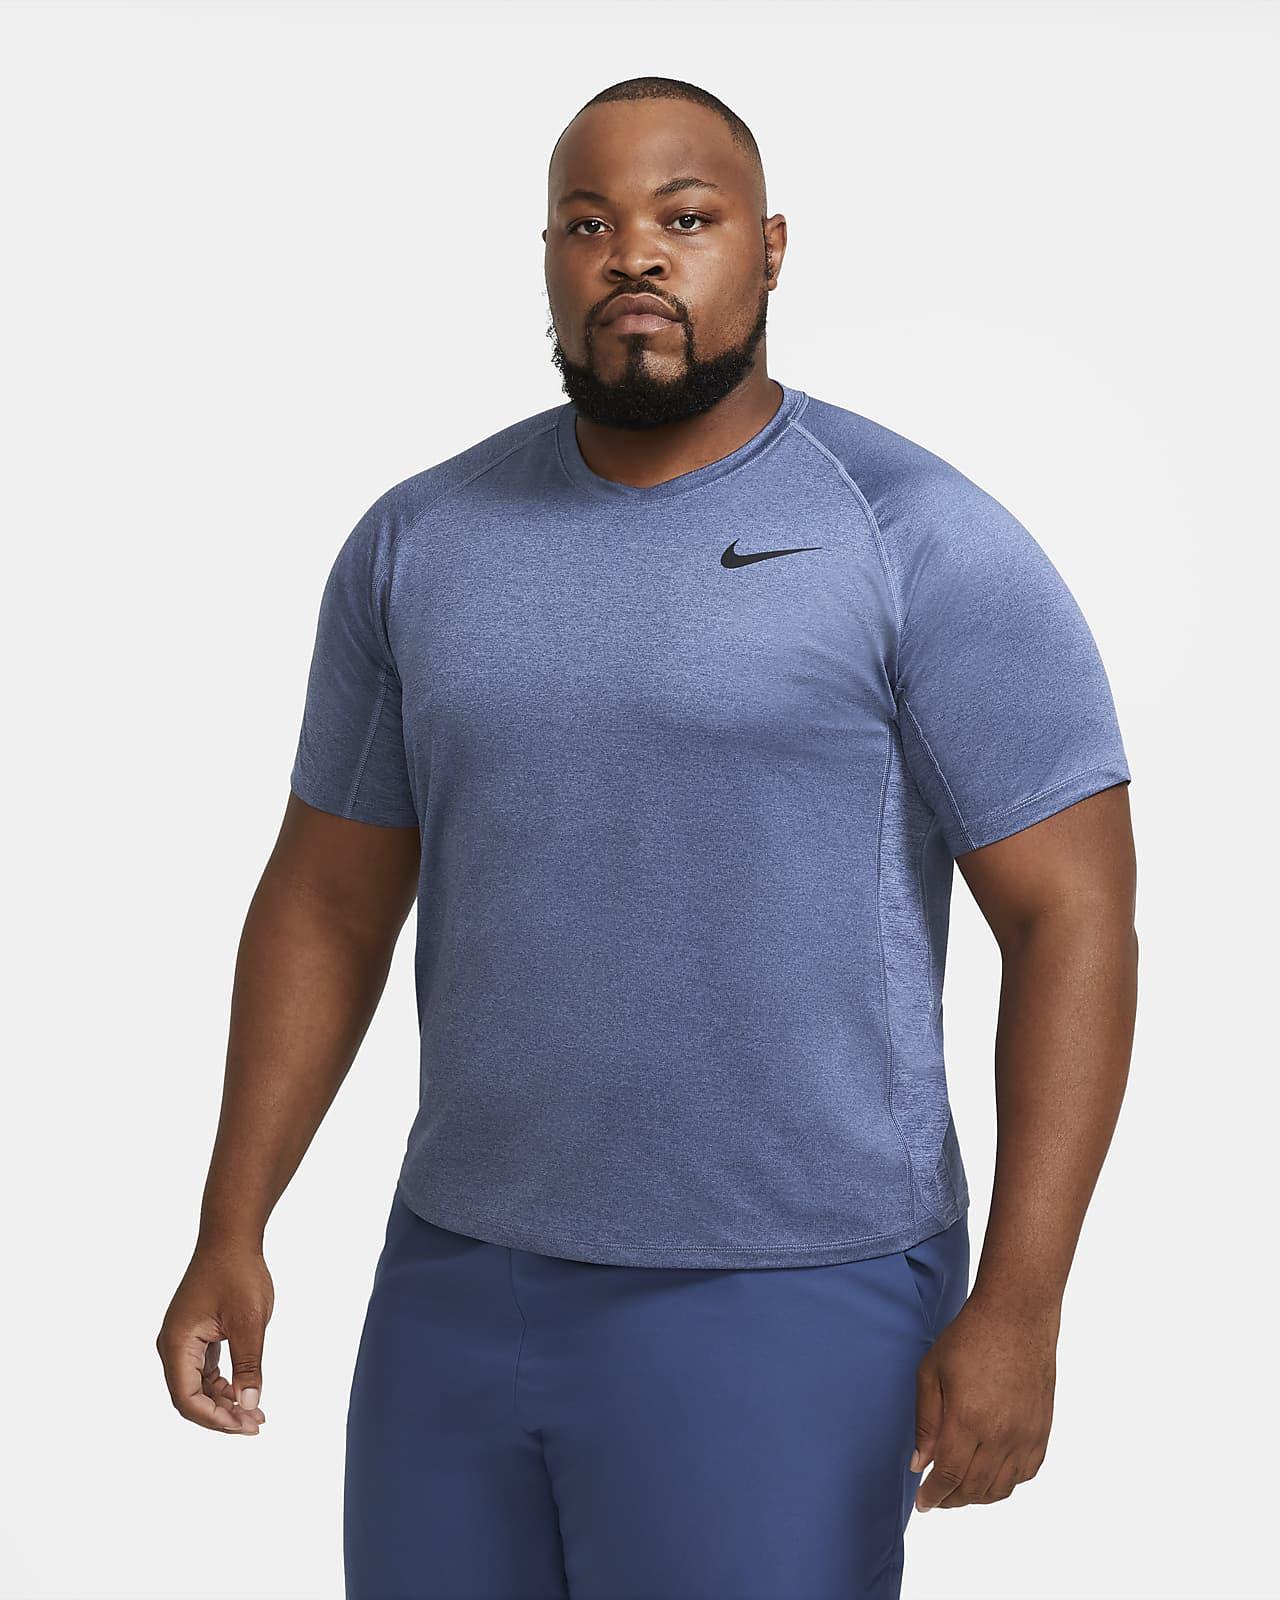 Nike PRO Top Short-Sleeve Comp Canottiera Sportiva Uomo